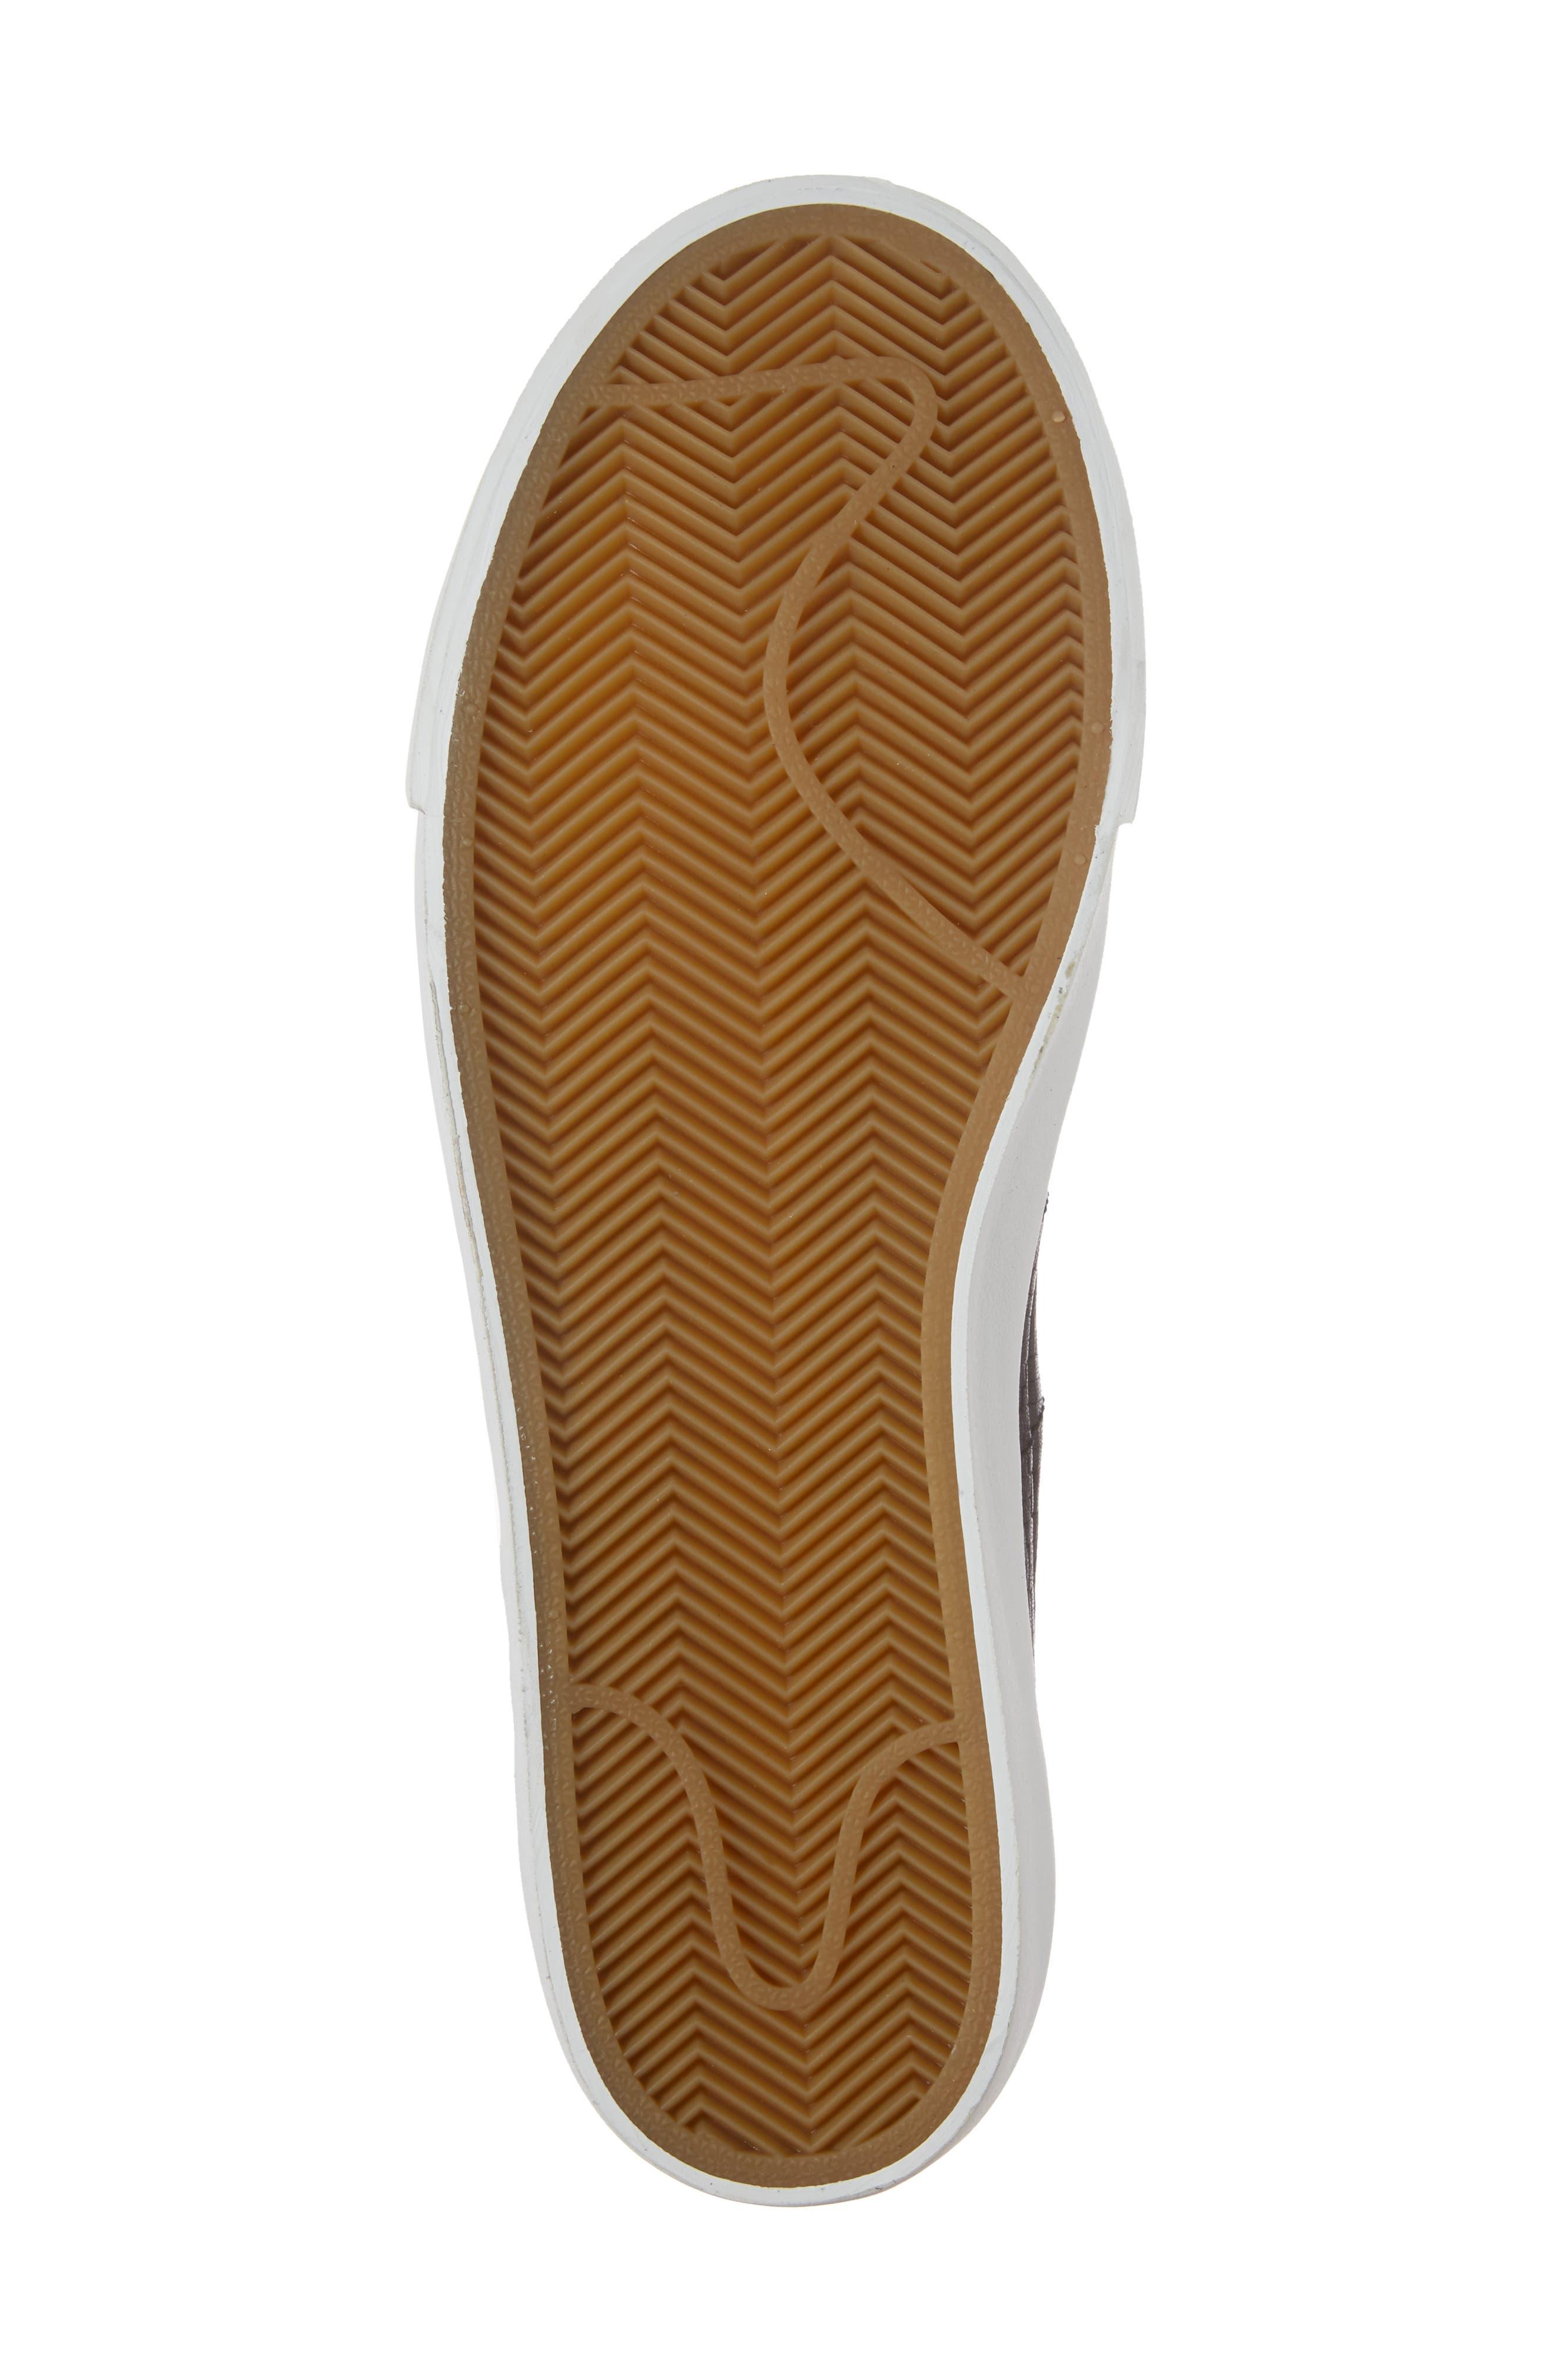 Blazer Studio Sneaker,                             Alternate thumbnail 6, color,                             001